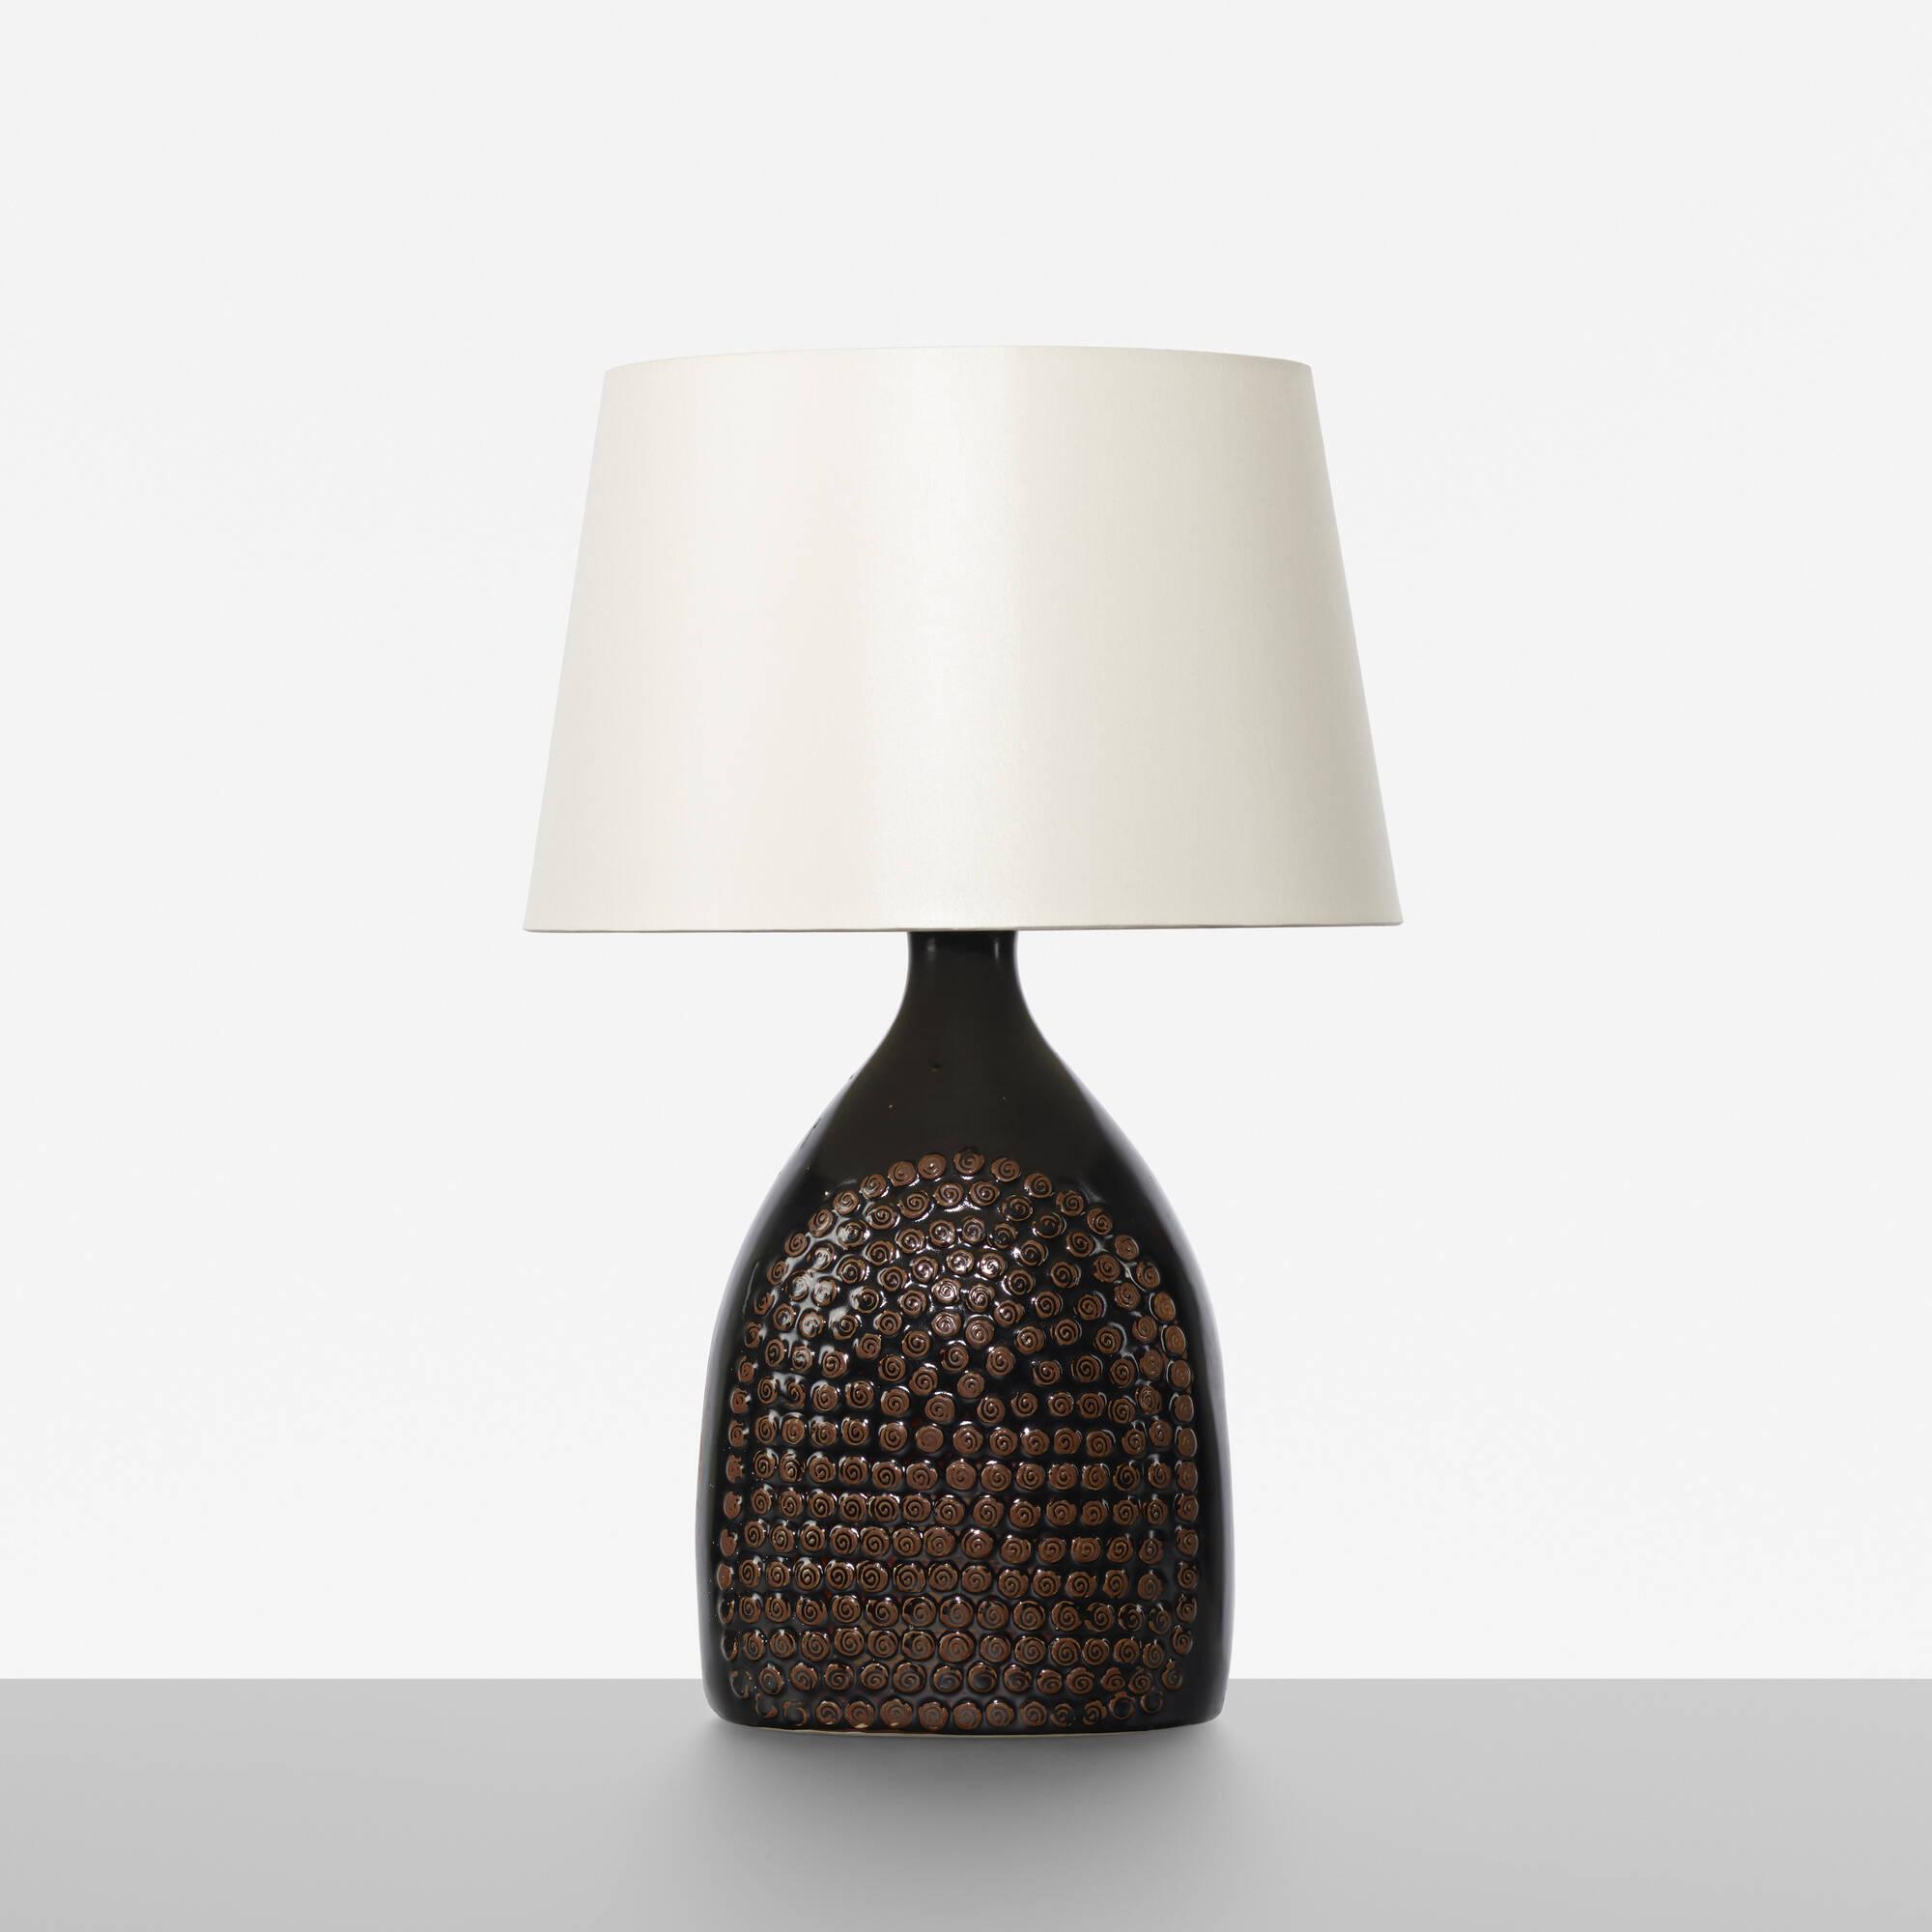 138: Stig Lindberg / table lamp (1 of 2)